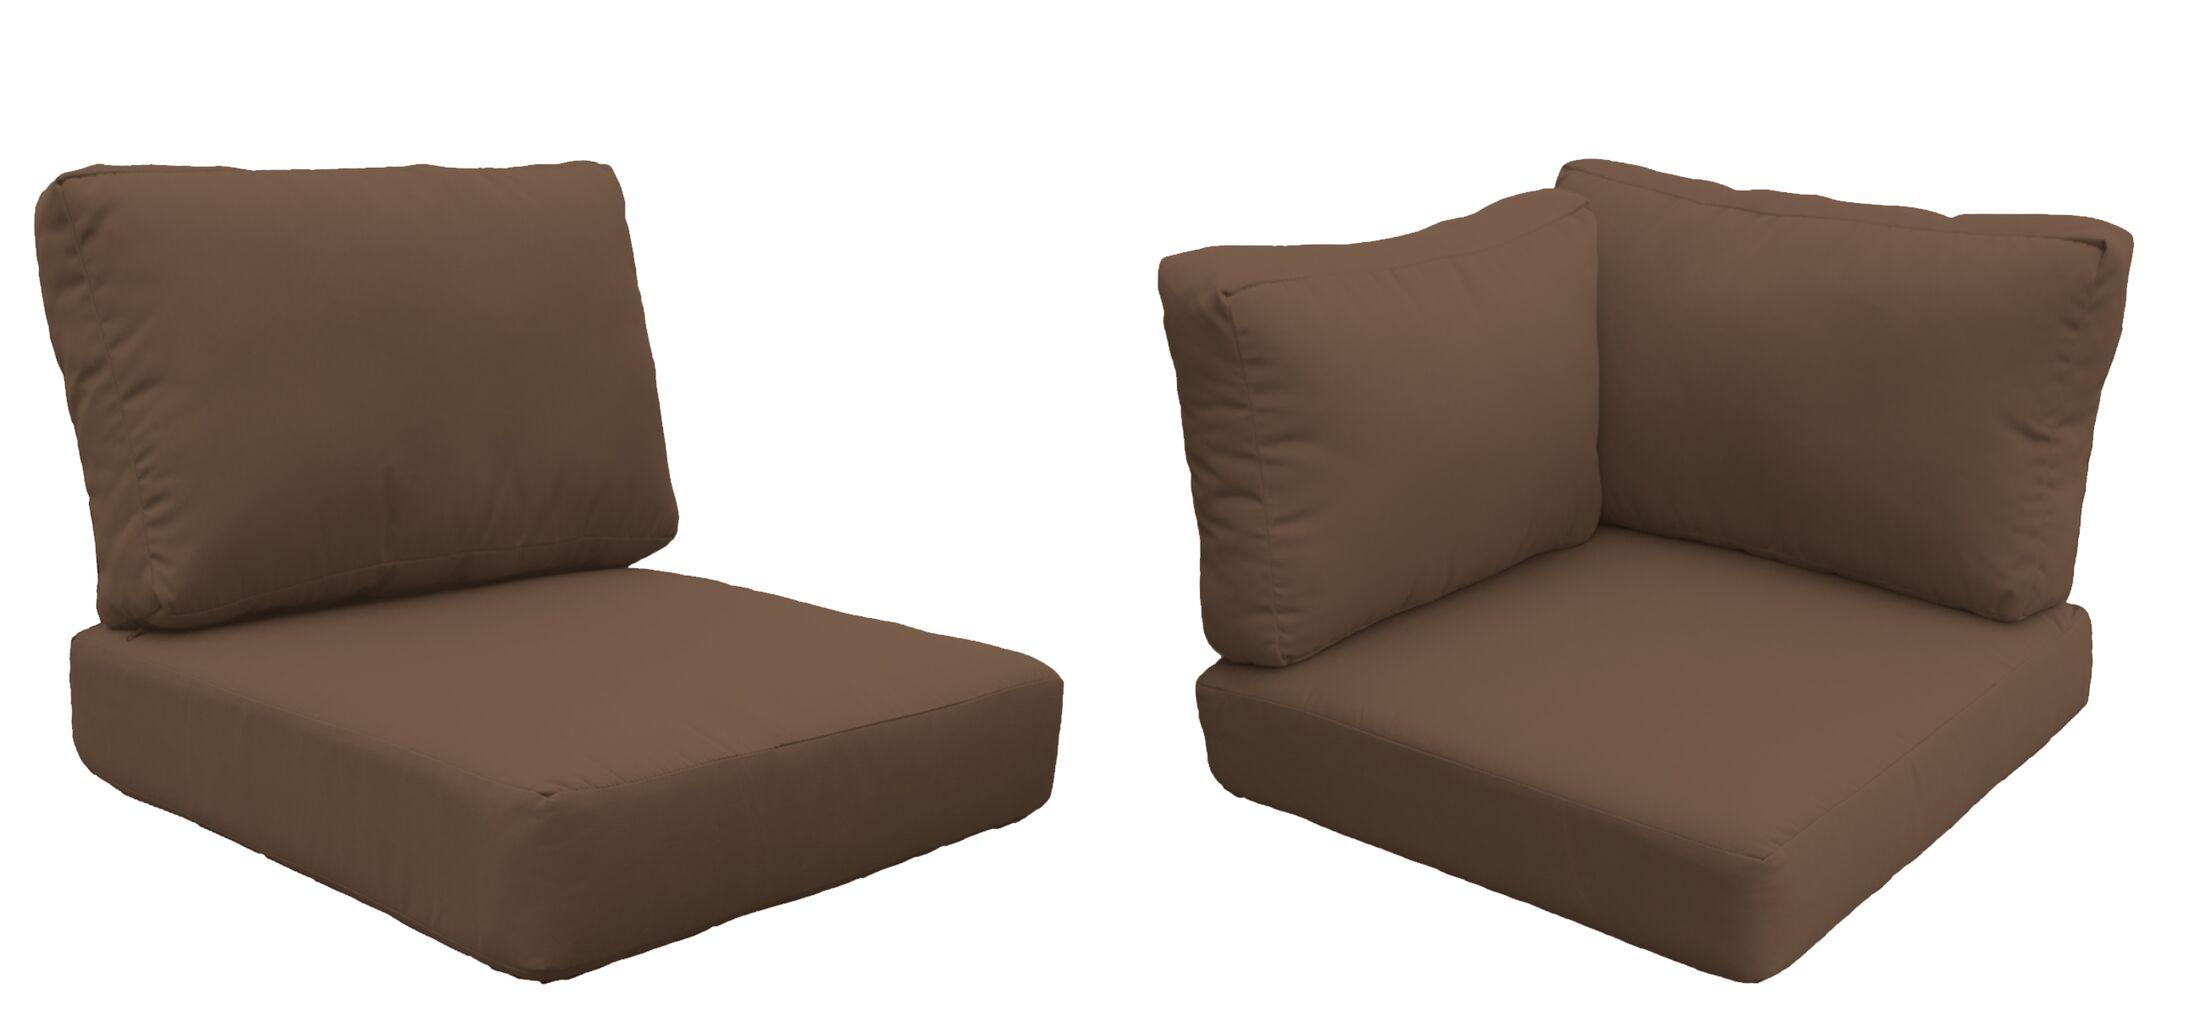 Miami 15 Piece Outdoor Cushion Set Fabric: Cocoa